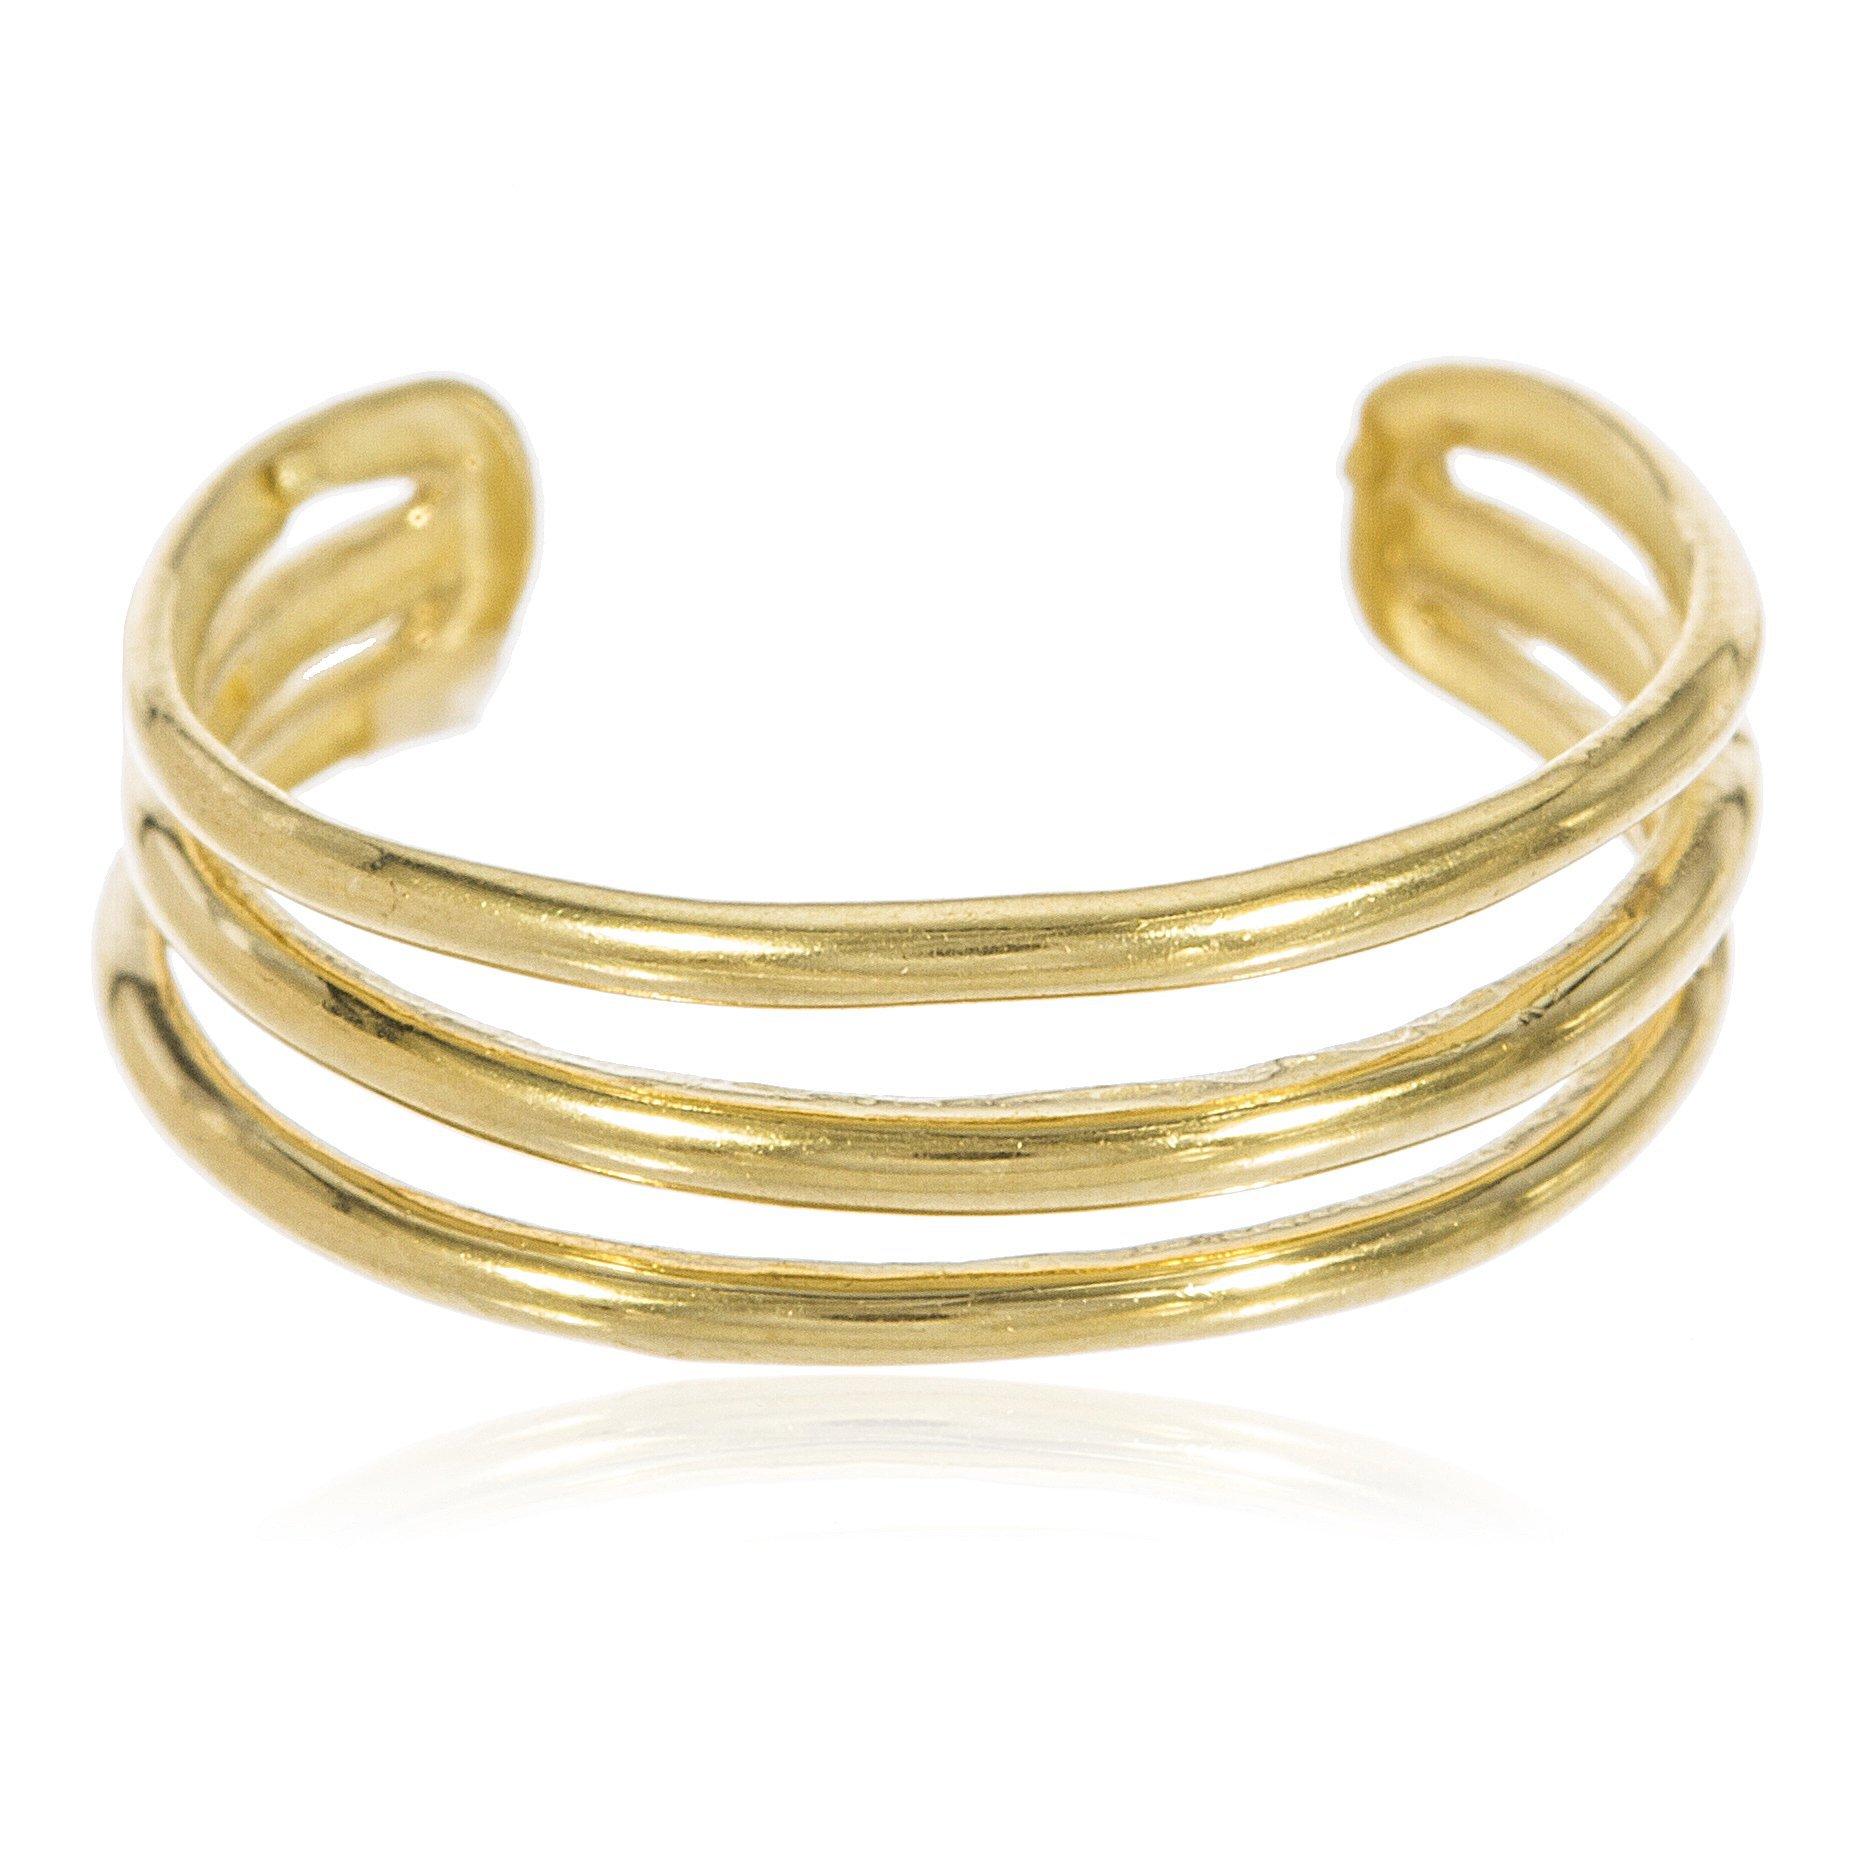 JOTW 10k Yellow Gold Three Wire Toe Ring (GO-541)